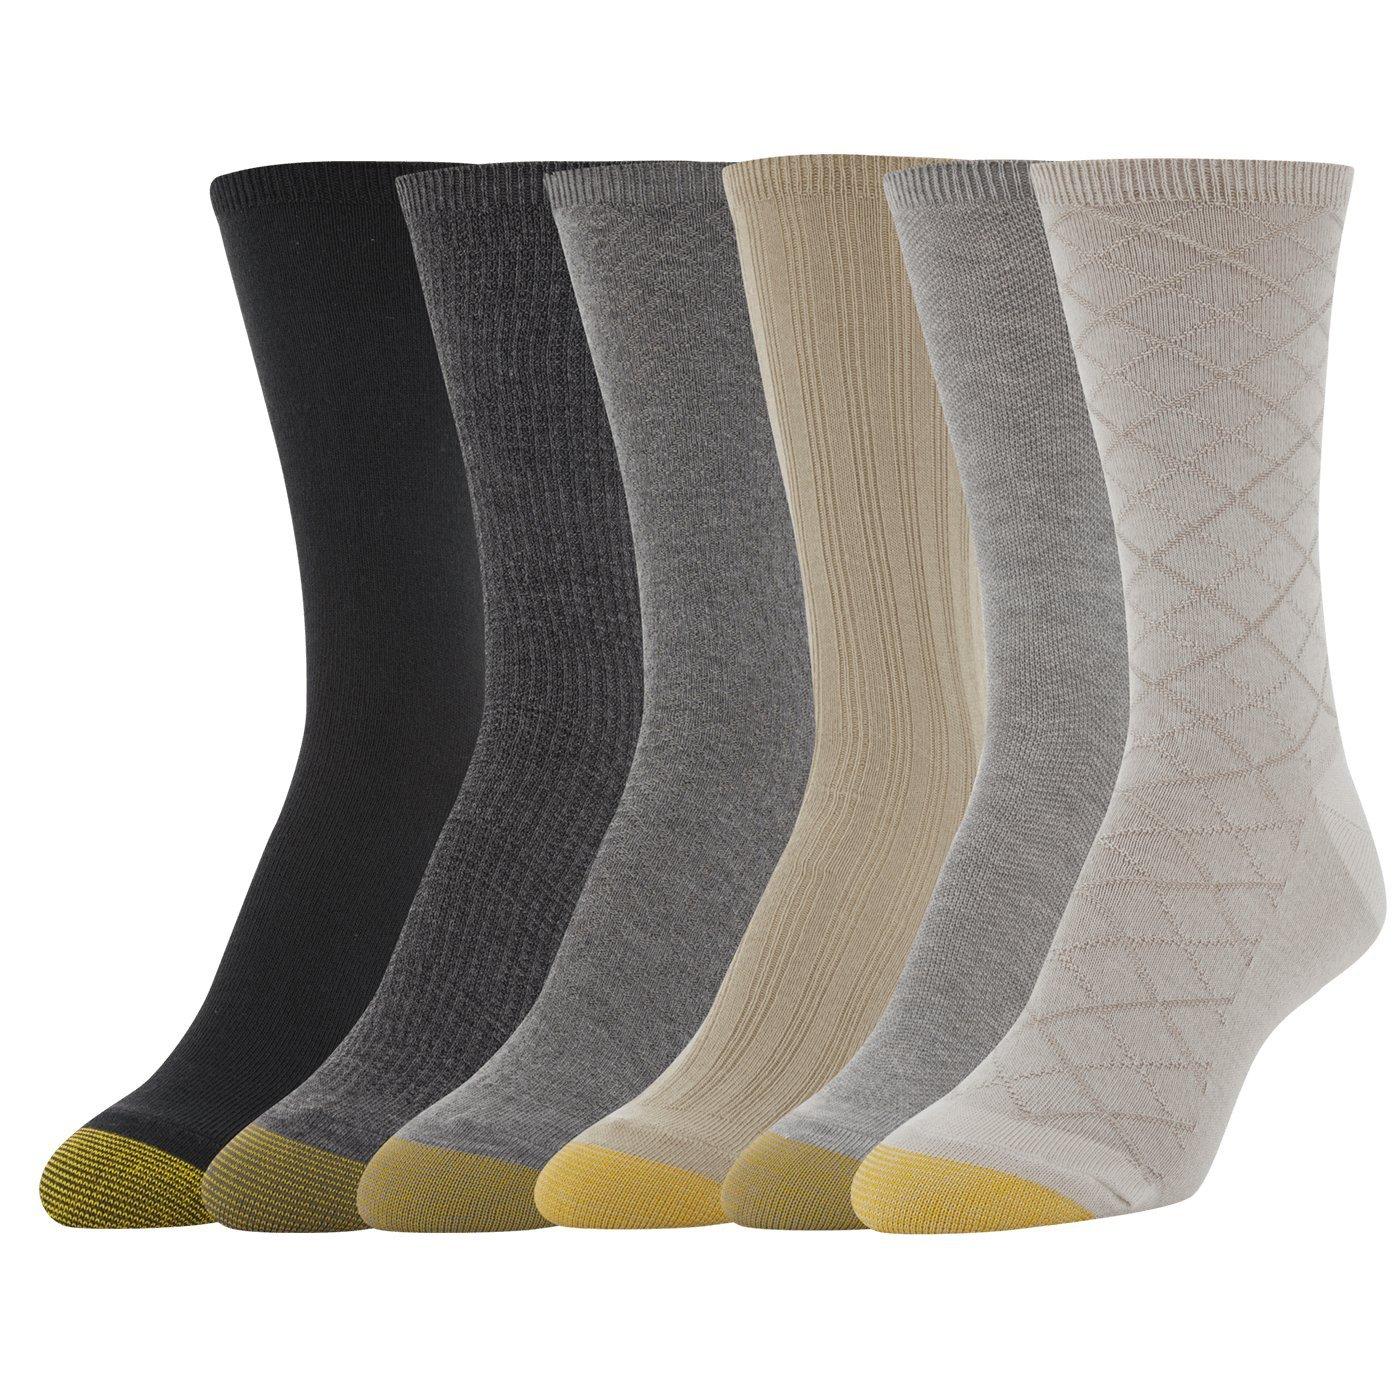 6 Pairs Gold Toe Womens Casual Texture Crew Socks